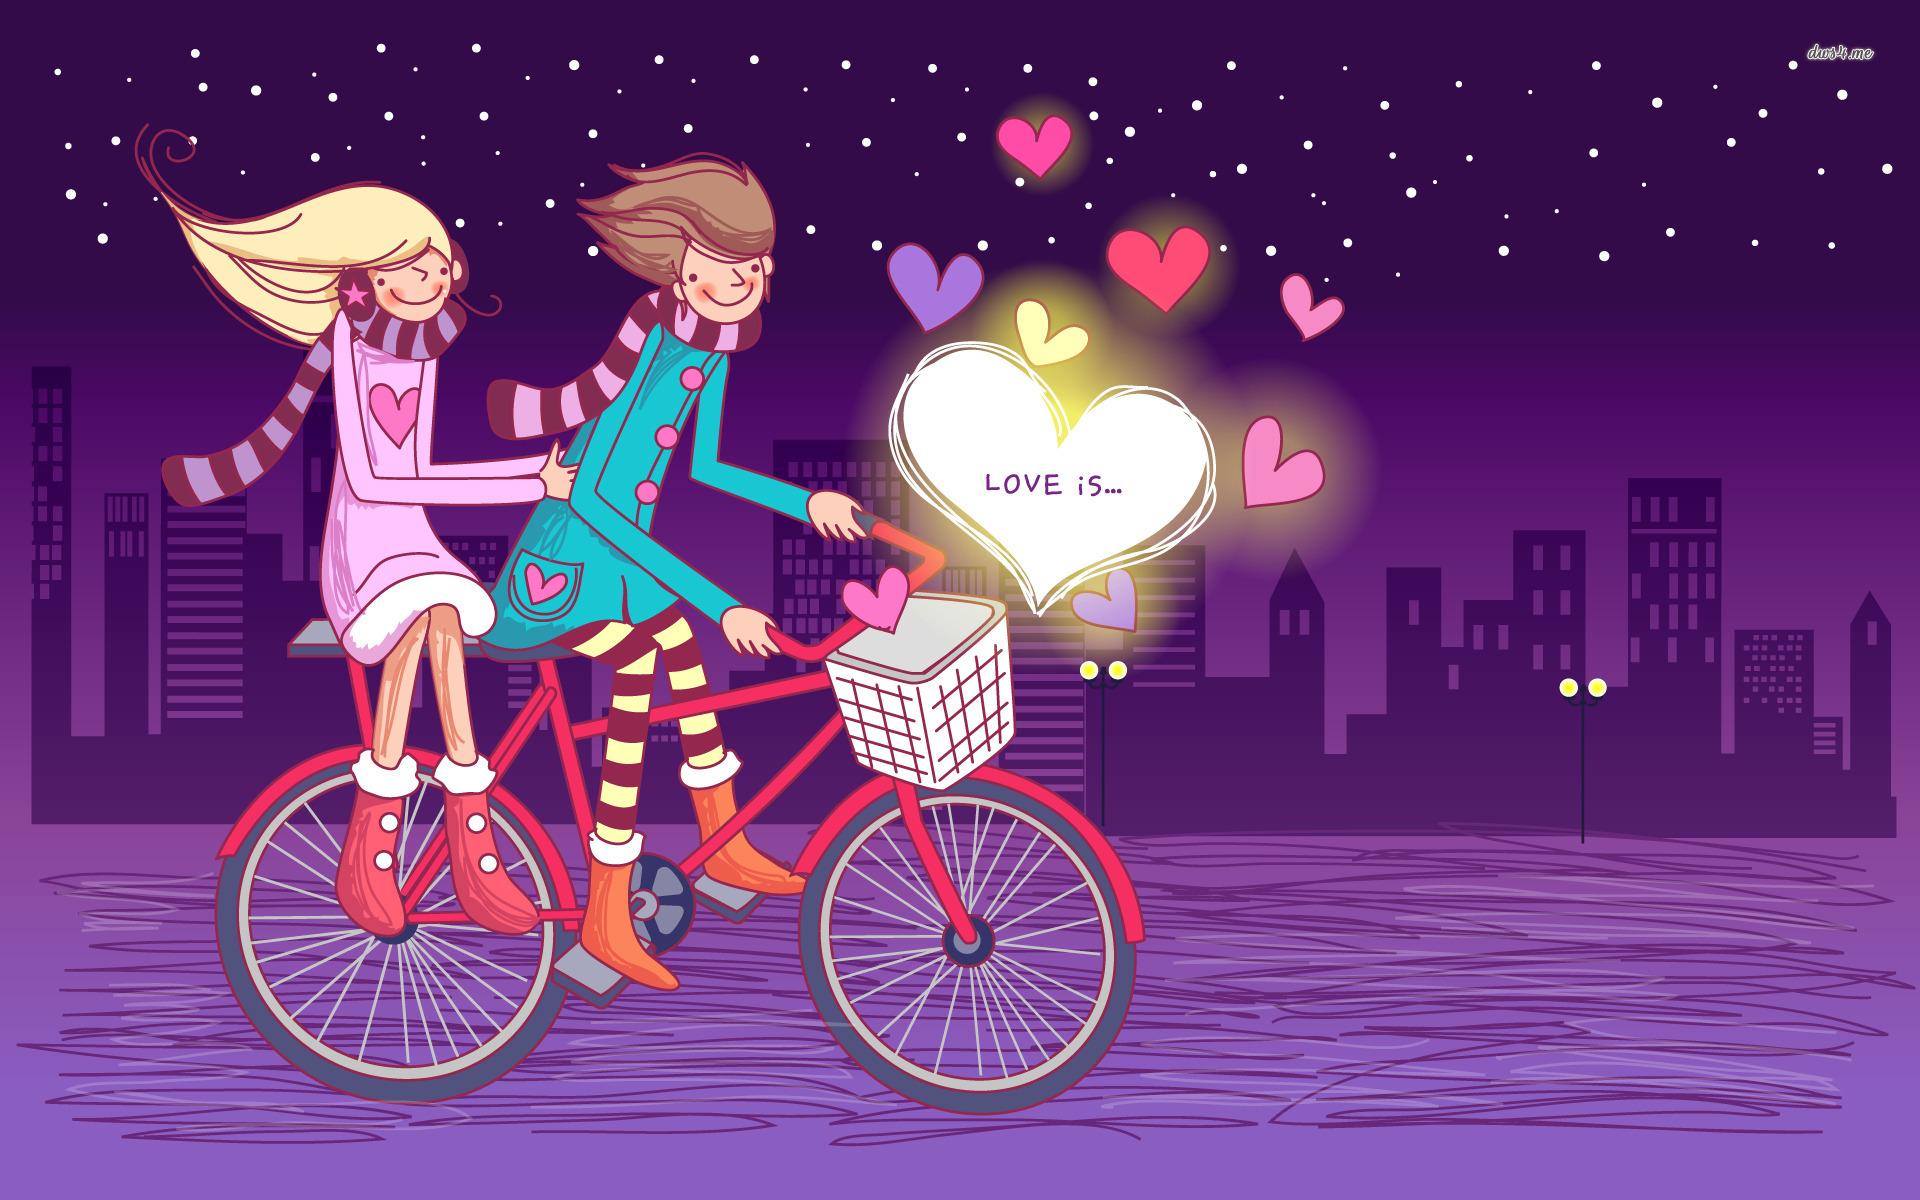 Love HD Wallpaper